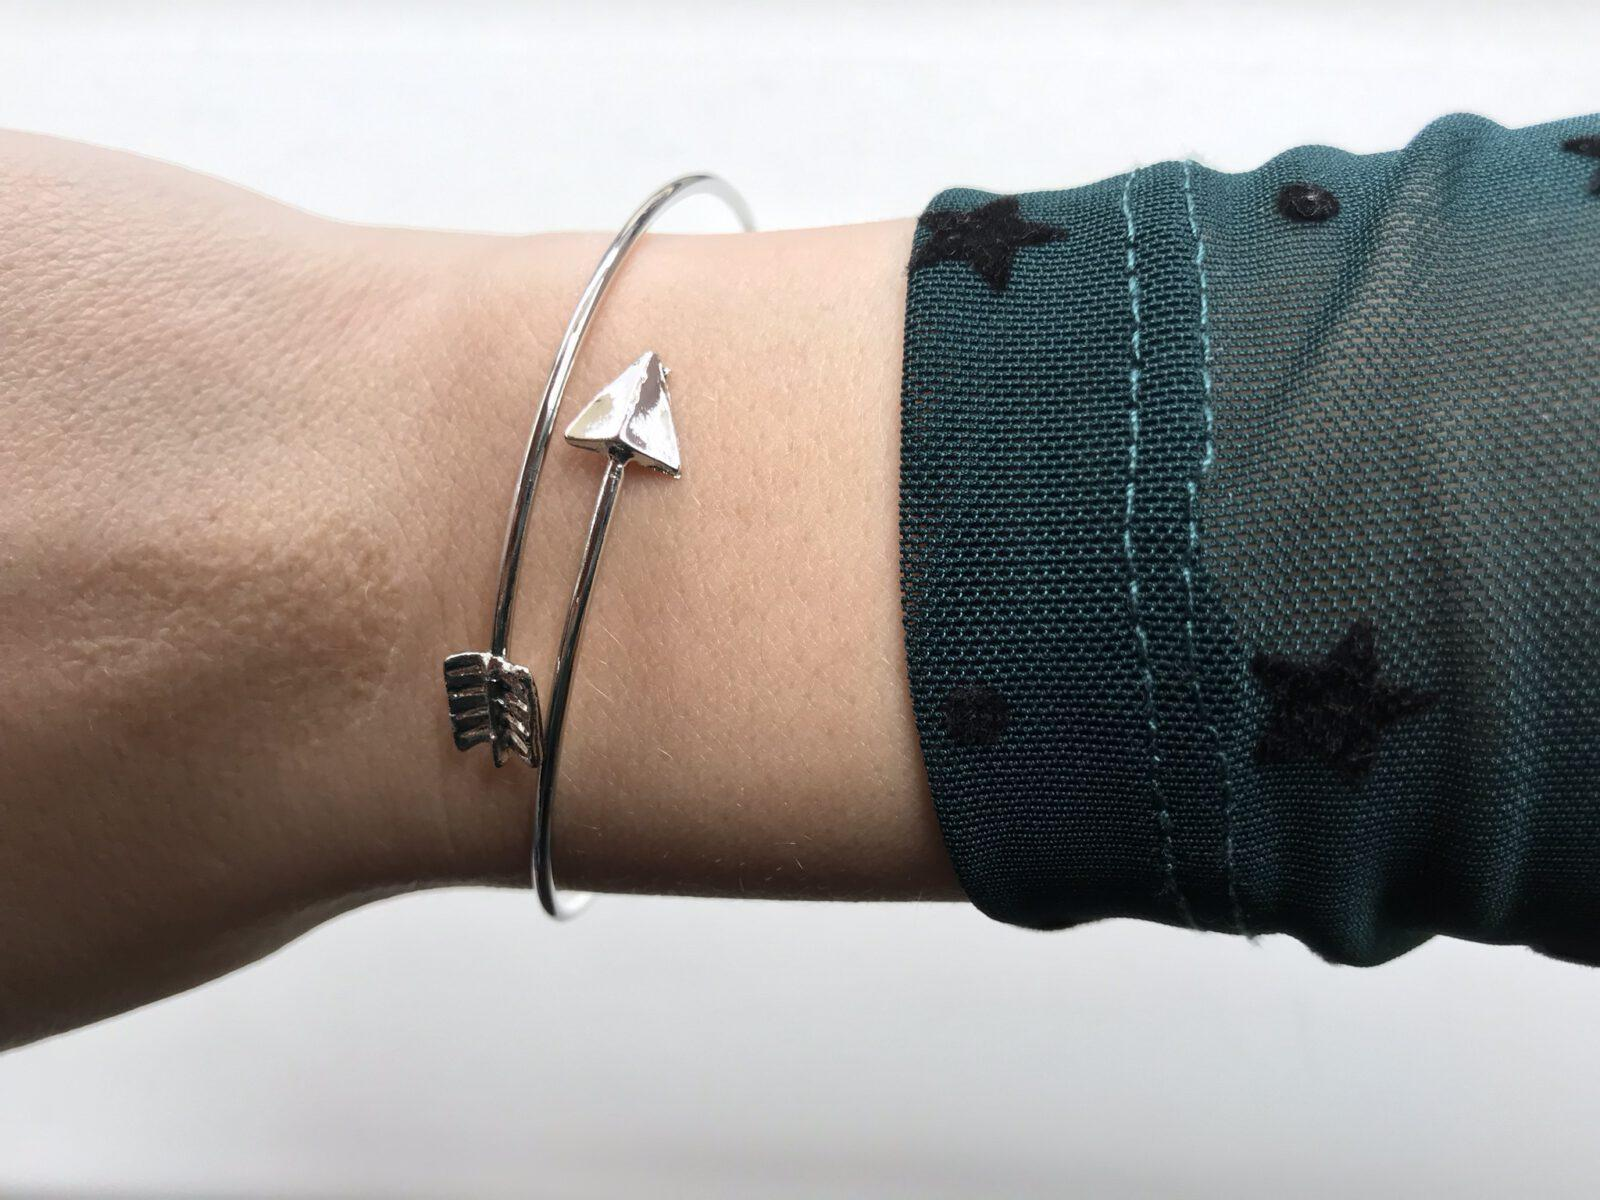 armband van Aphrodite mamazetkoers